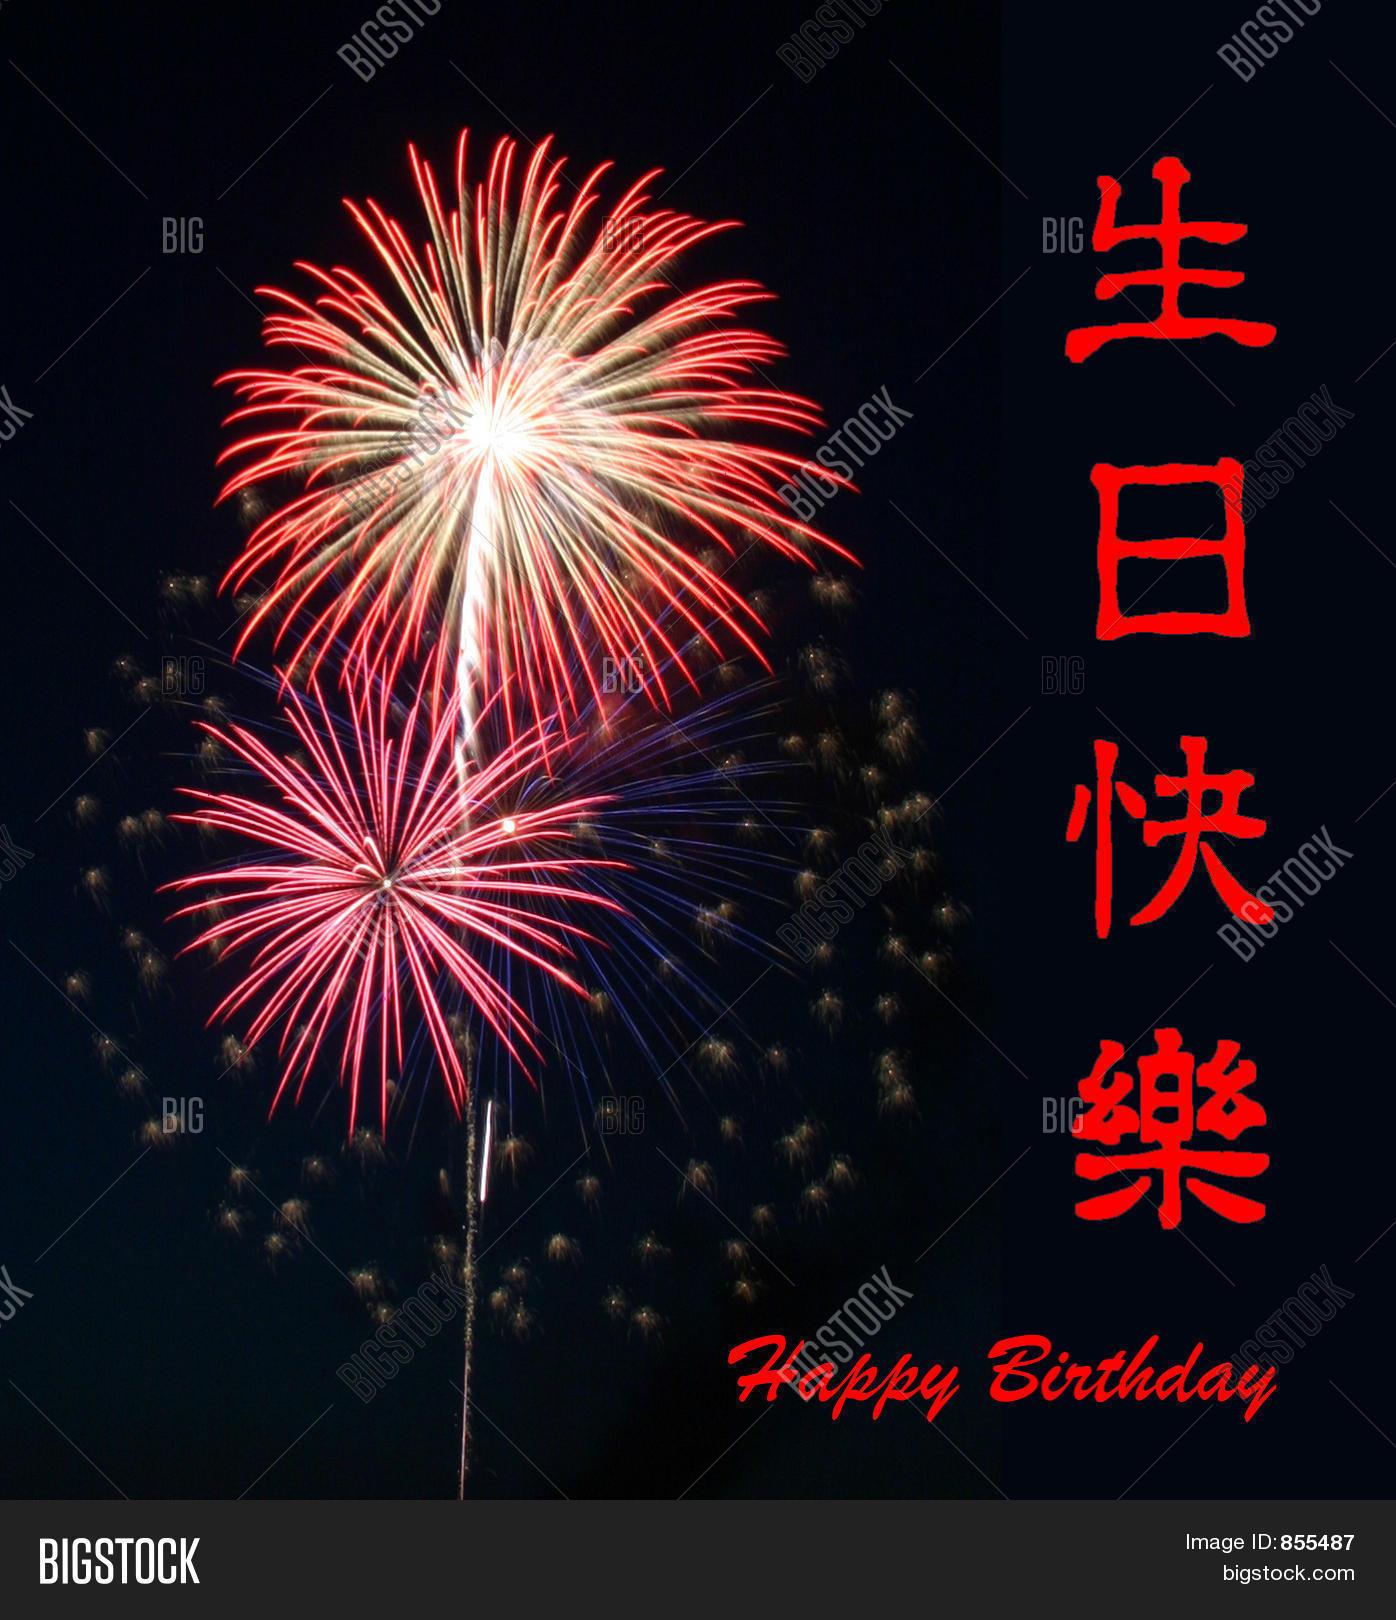 Happy Birthday Chinese Image & Photo (Free Trial)